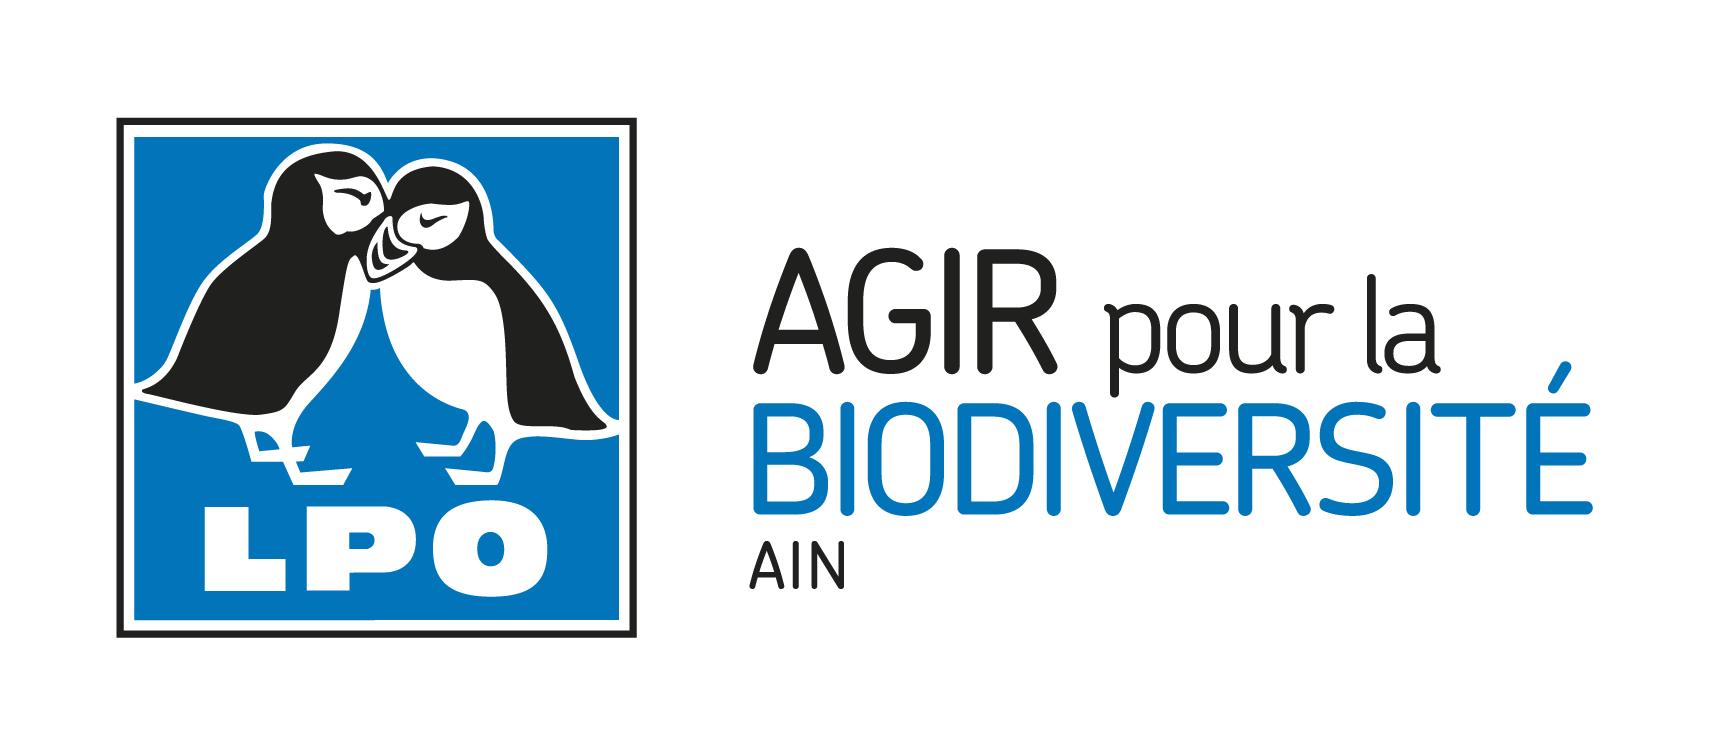 https://cdnfiles2.biolovision.net/www.faune-ain.org/userfiles/LPOAgirpourlabioAin.png